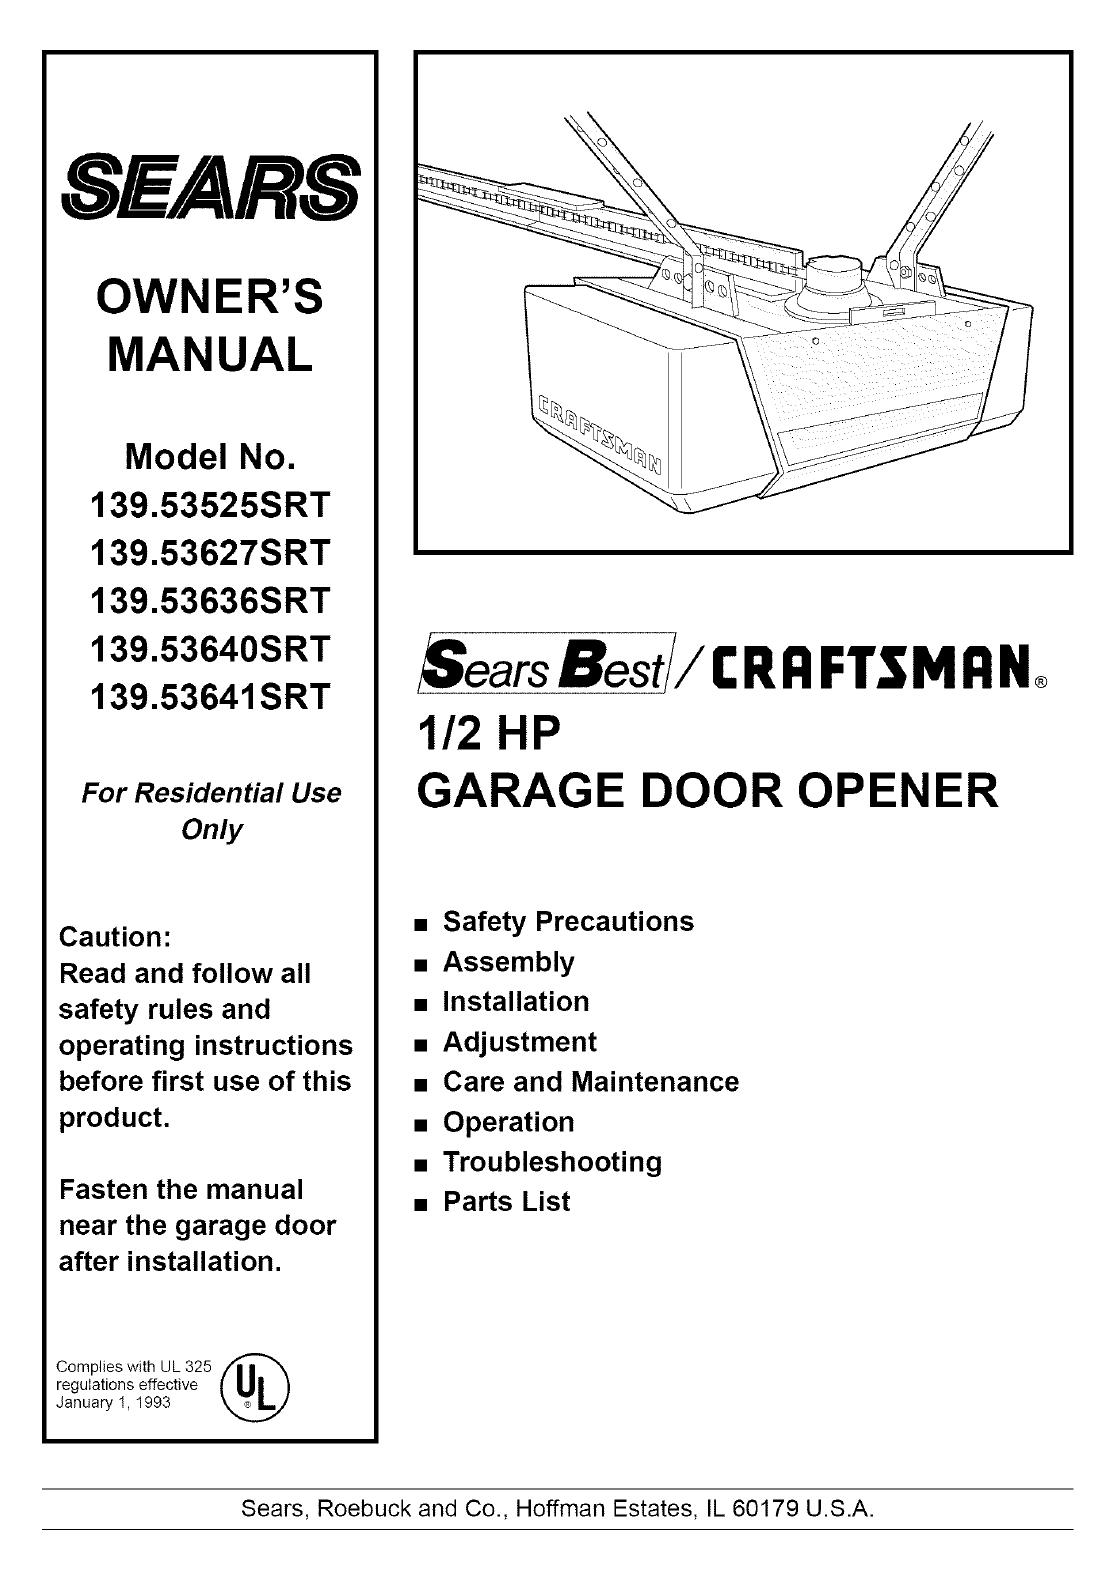 Craftsman Garage Door Opener Owners Manual 1 2 Hp - gaurani ... on